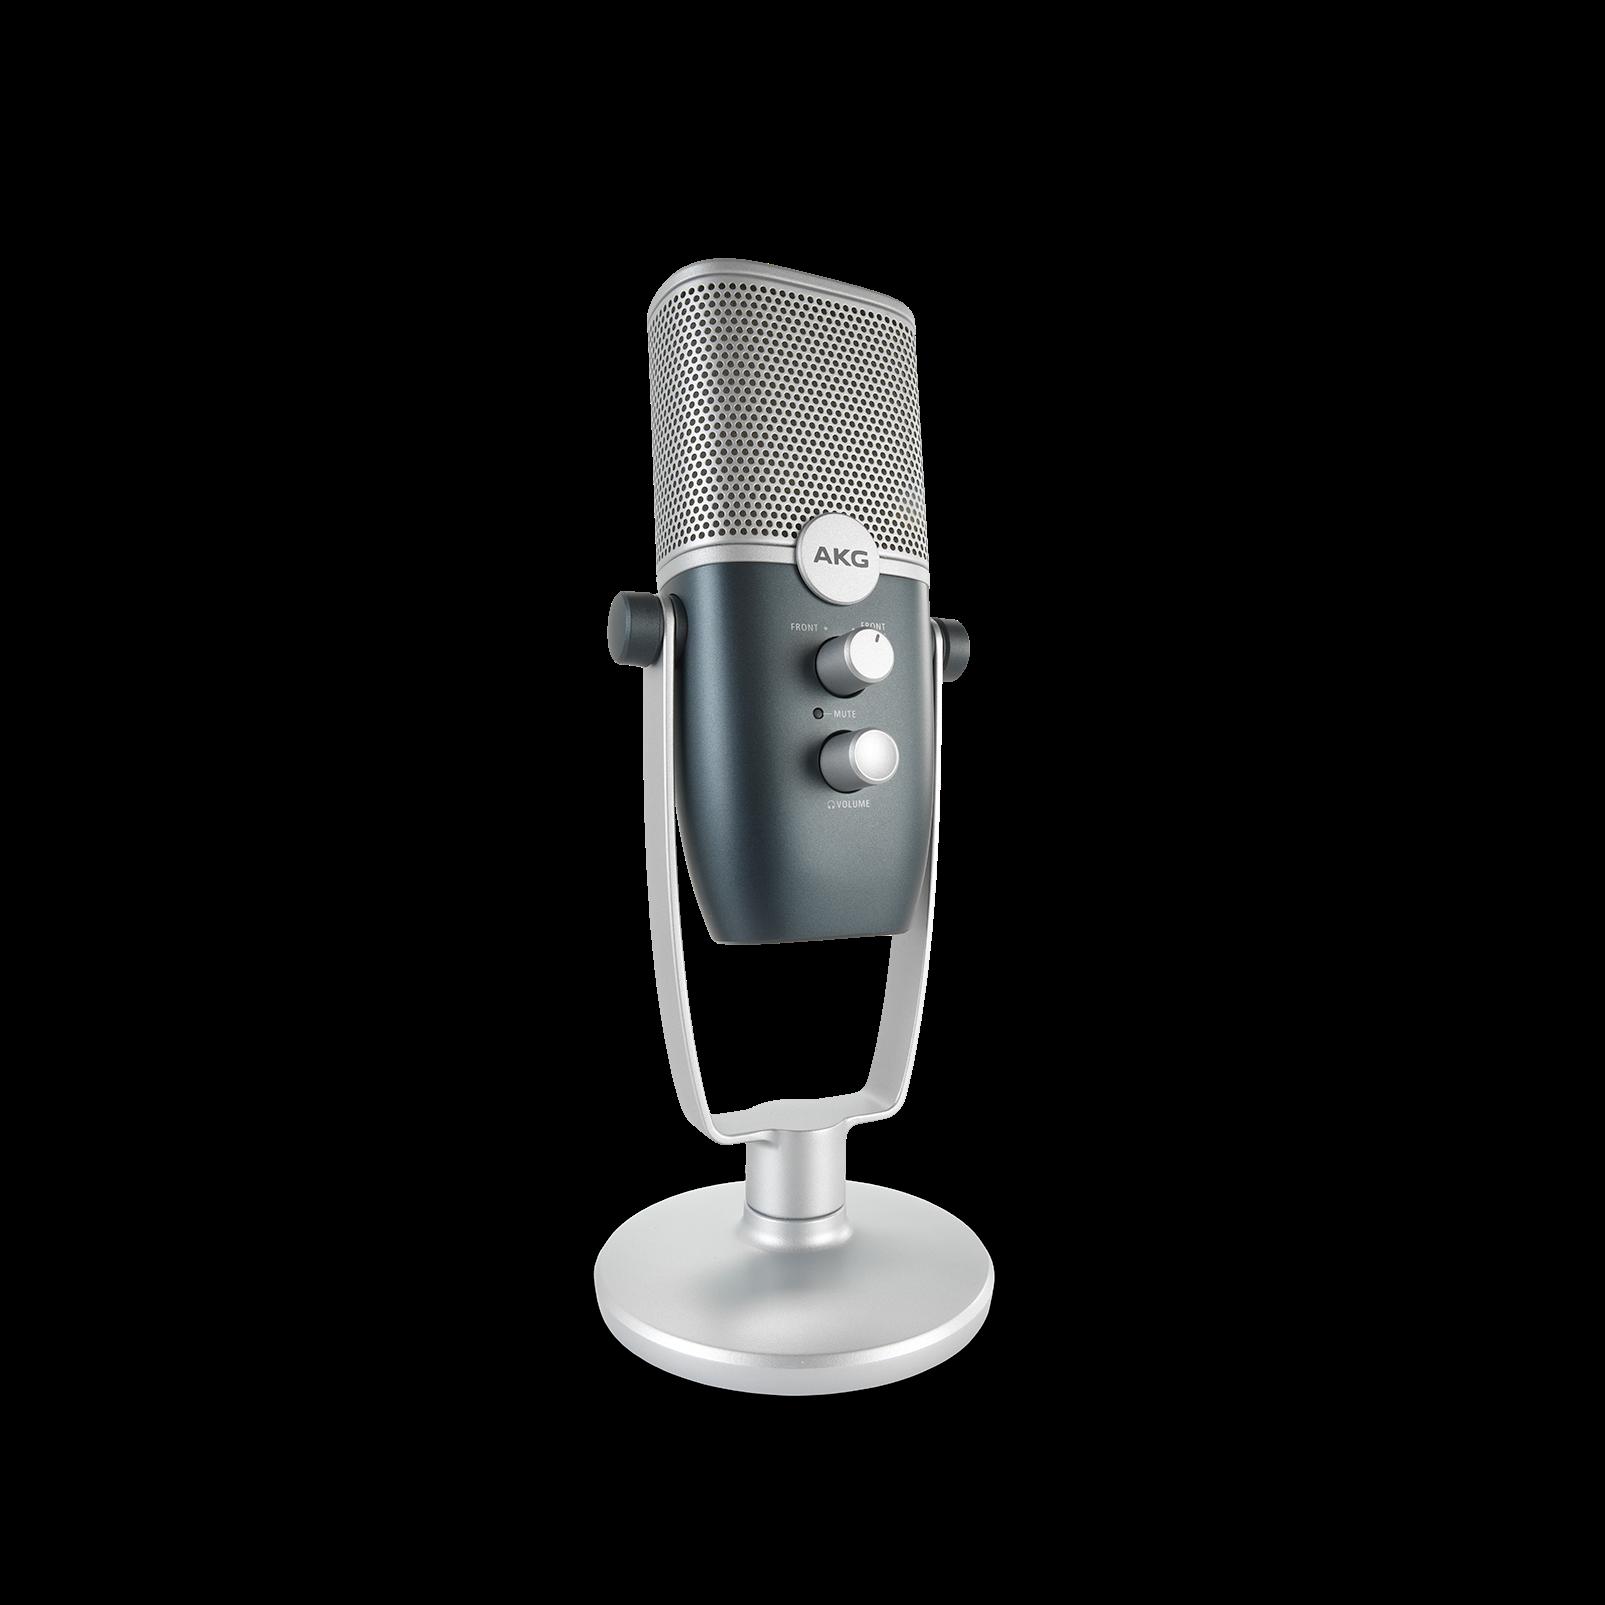 AKG Ara - Blue - Professional Two-Pattern USB Condenser Microphone - Detailshot 4